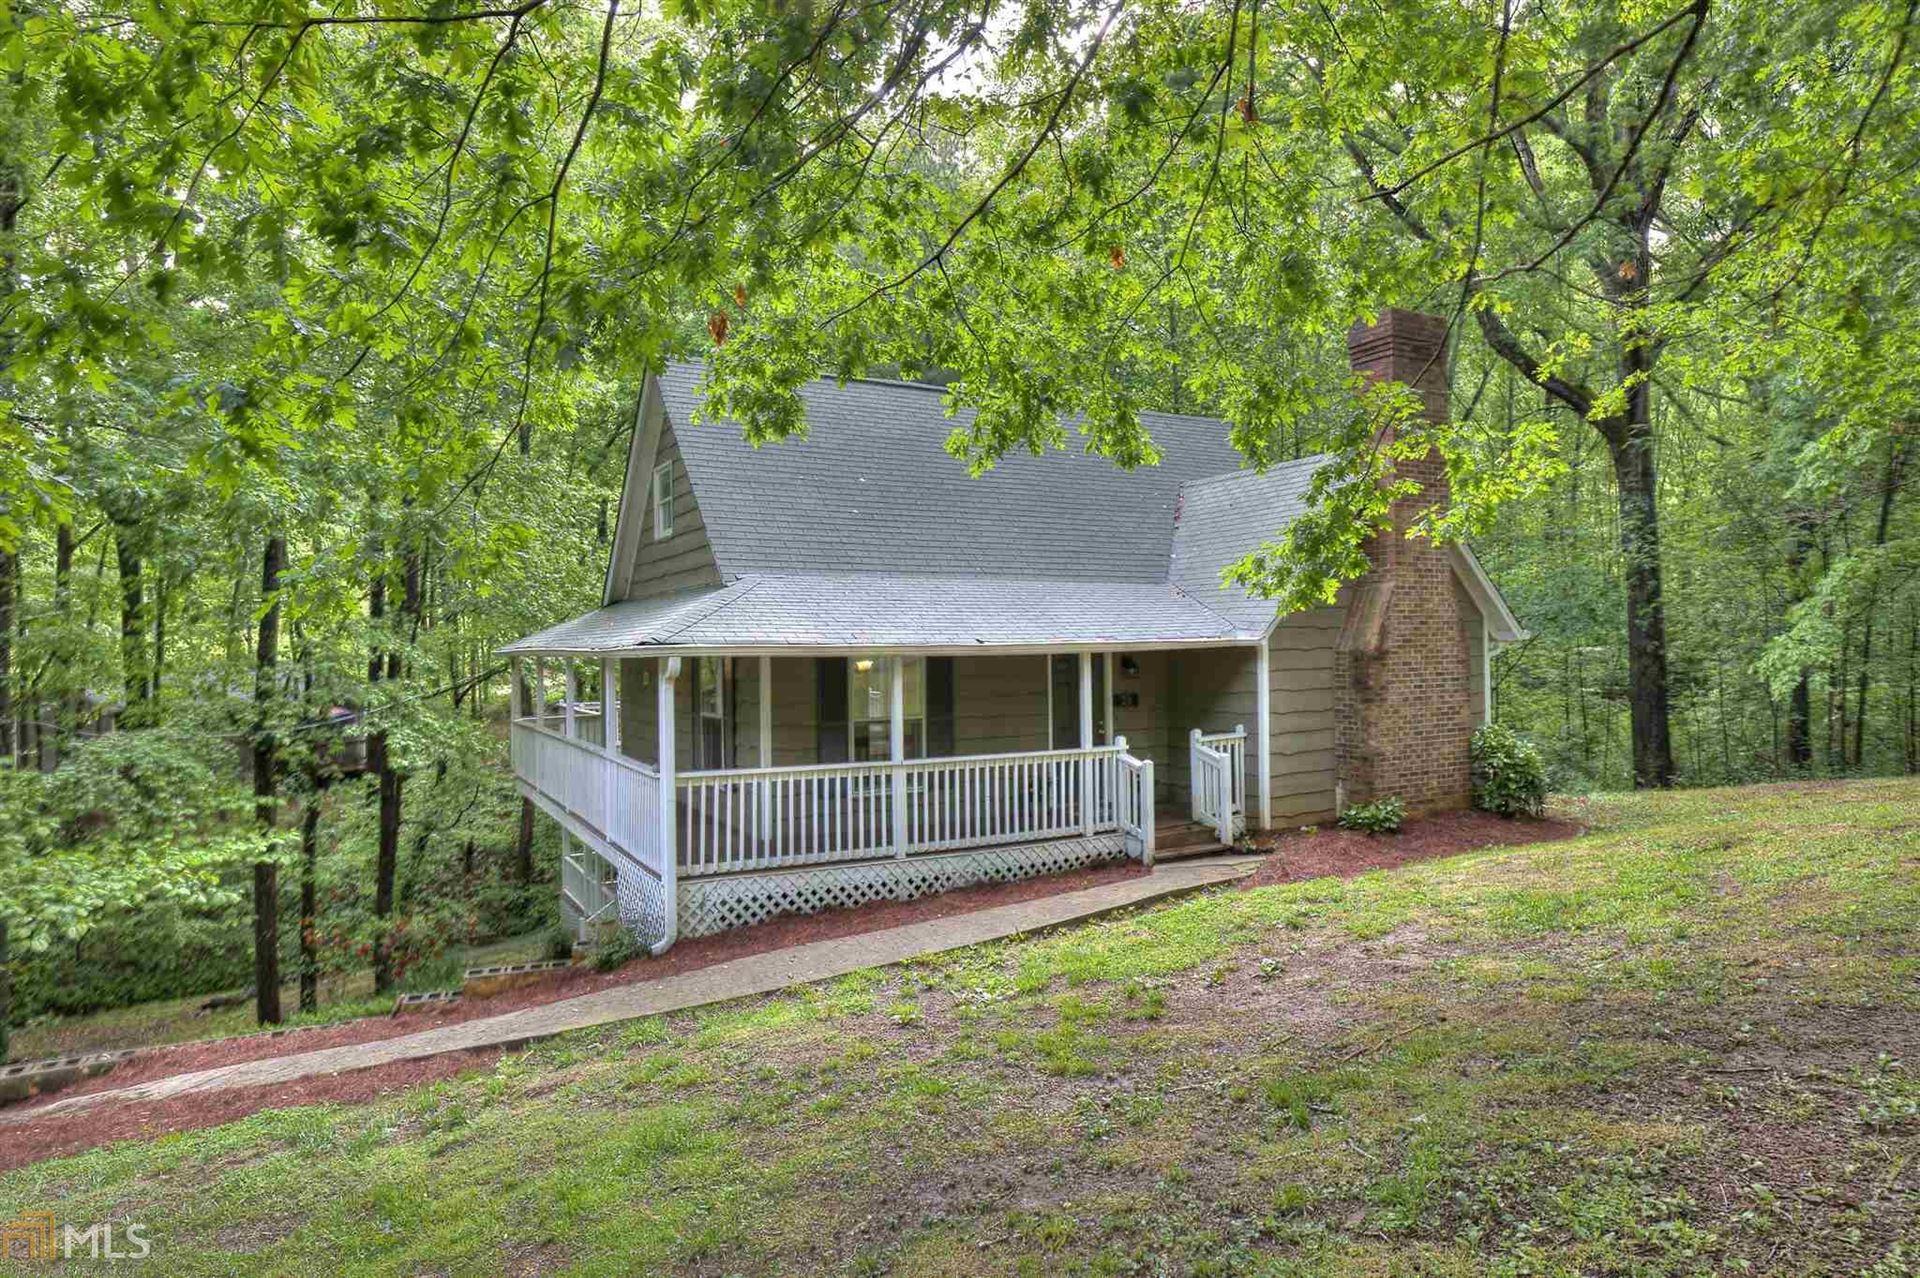 25 Old Mckaskey Creek Rd, Cartersville, GA 30121 - MLS#: 8973806